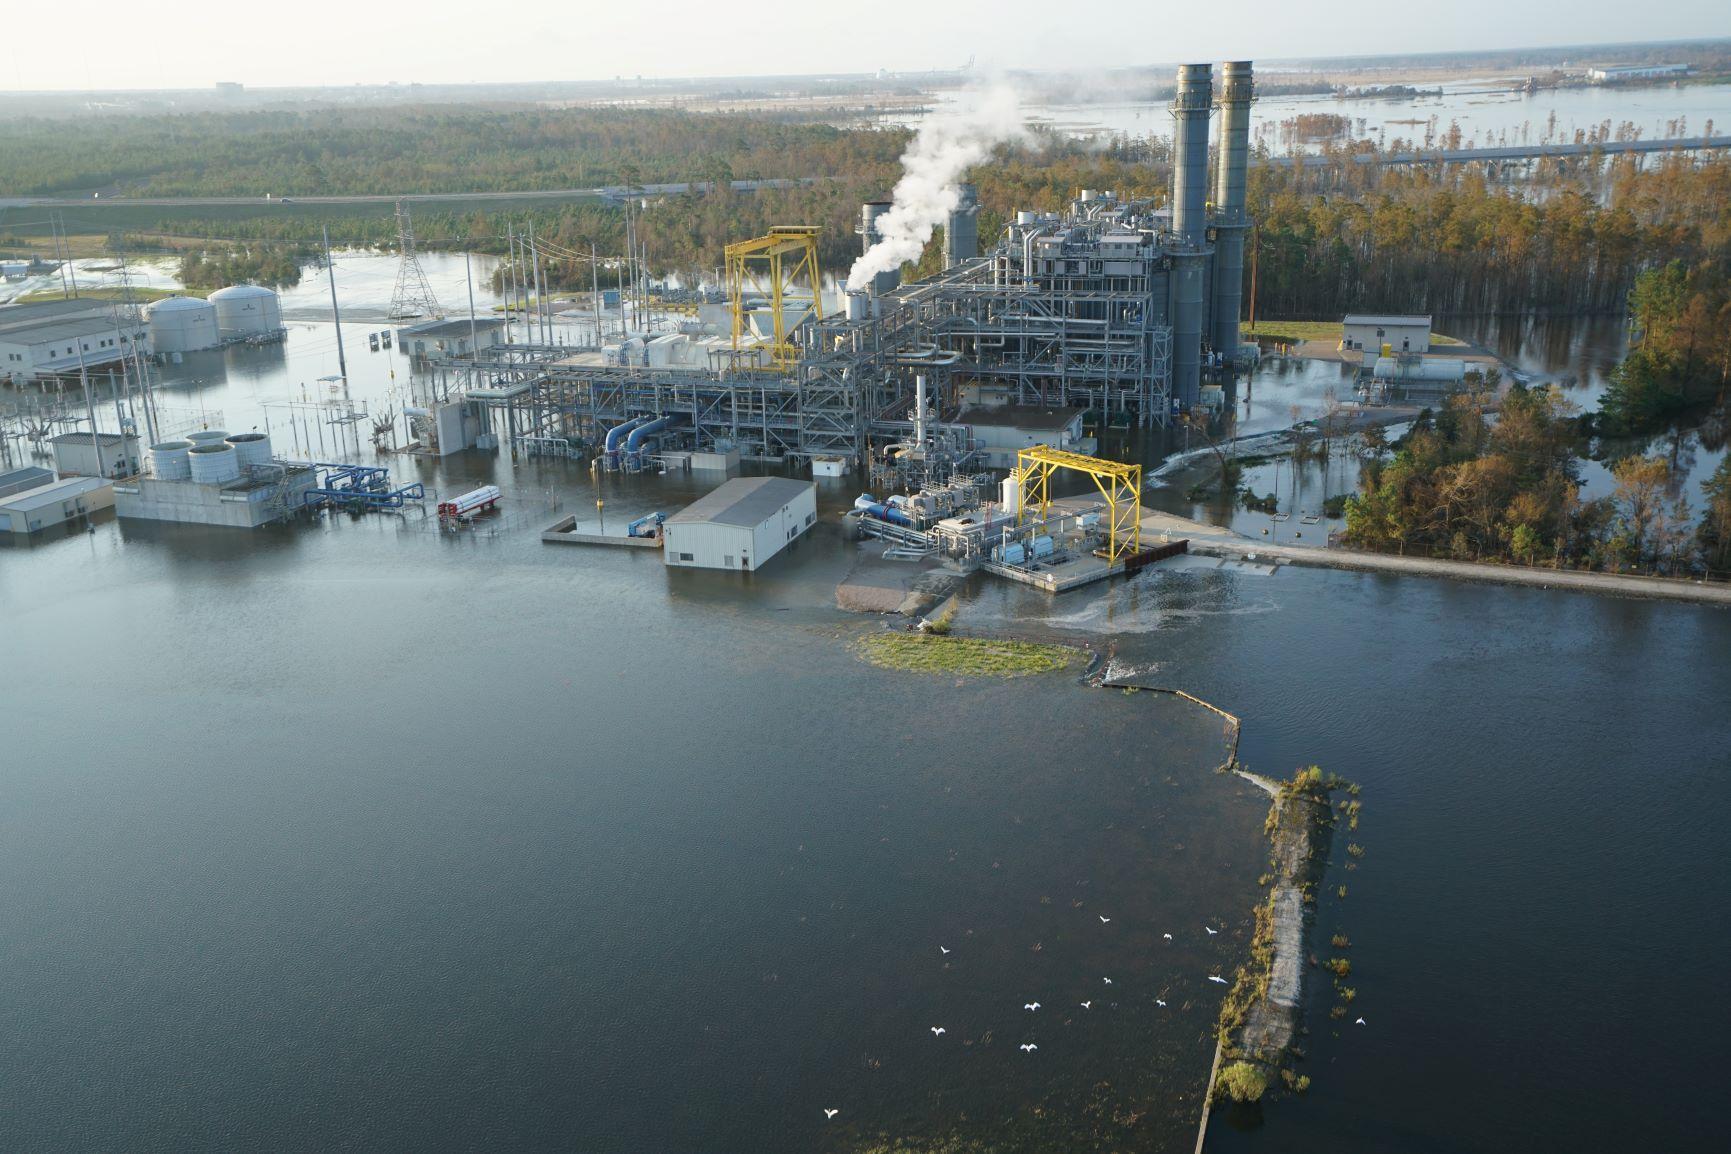 Dam breach at Duke plant in Wilmington; coal ash could spill — APNewsBreak